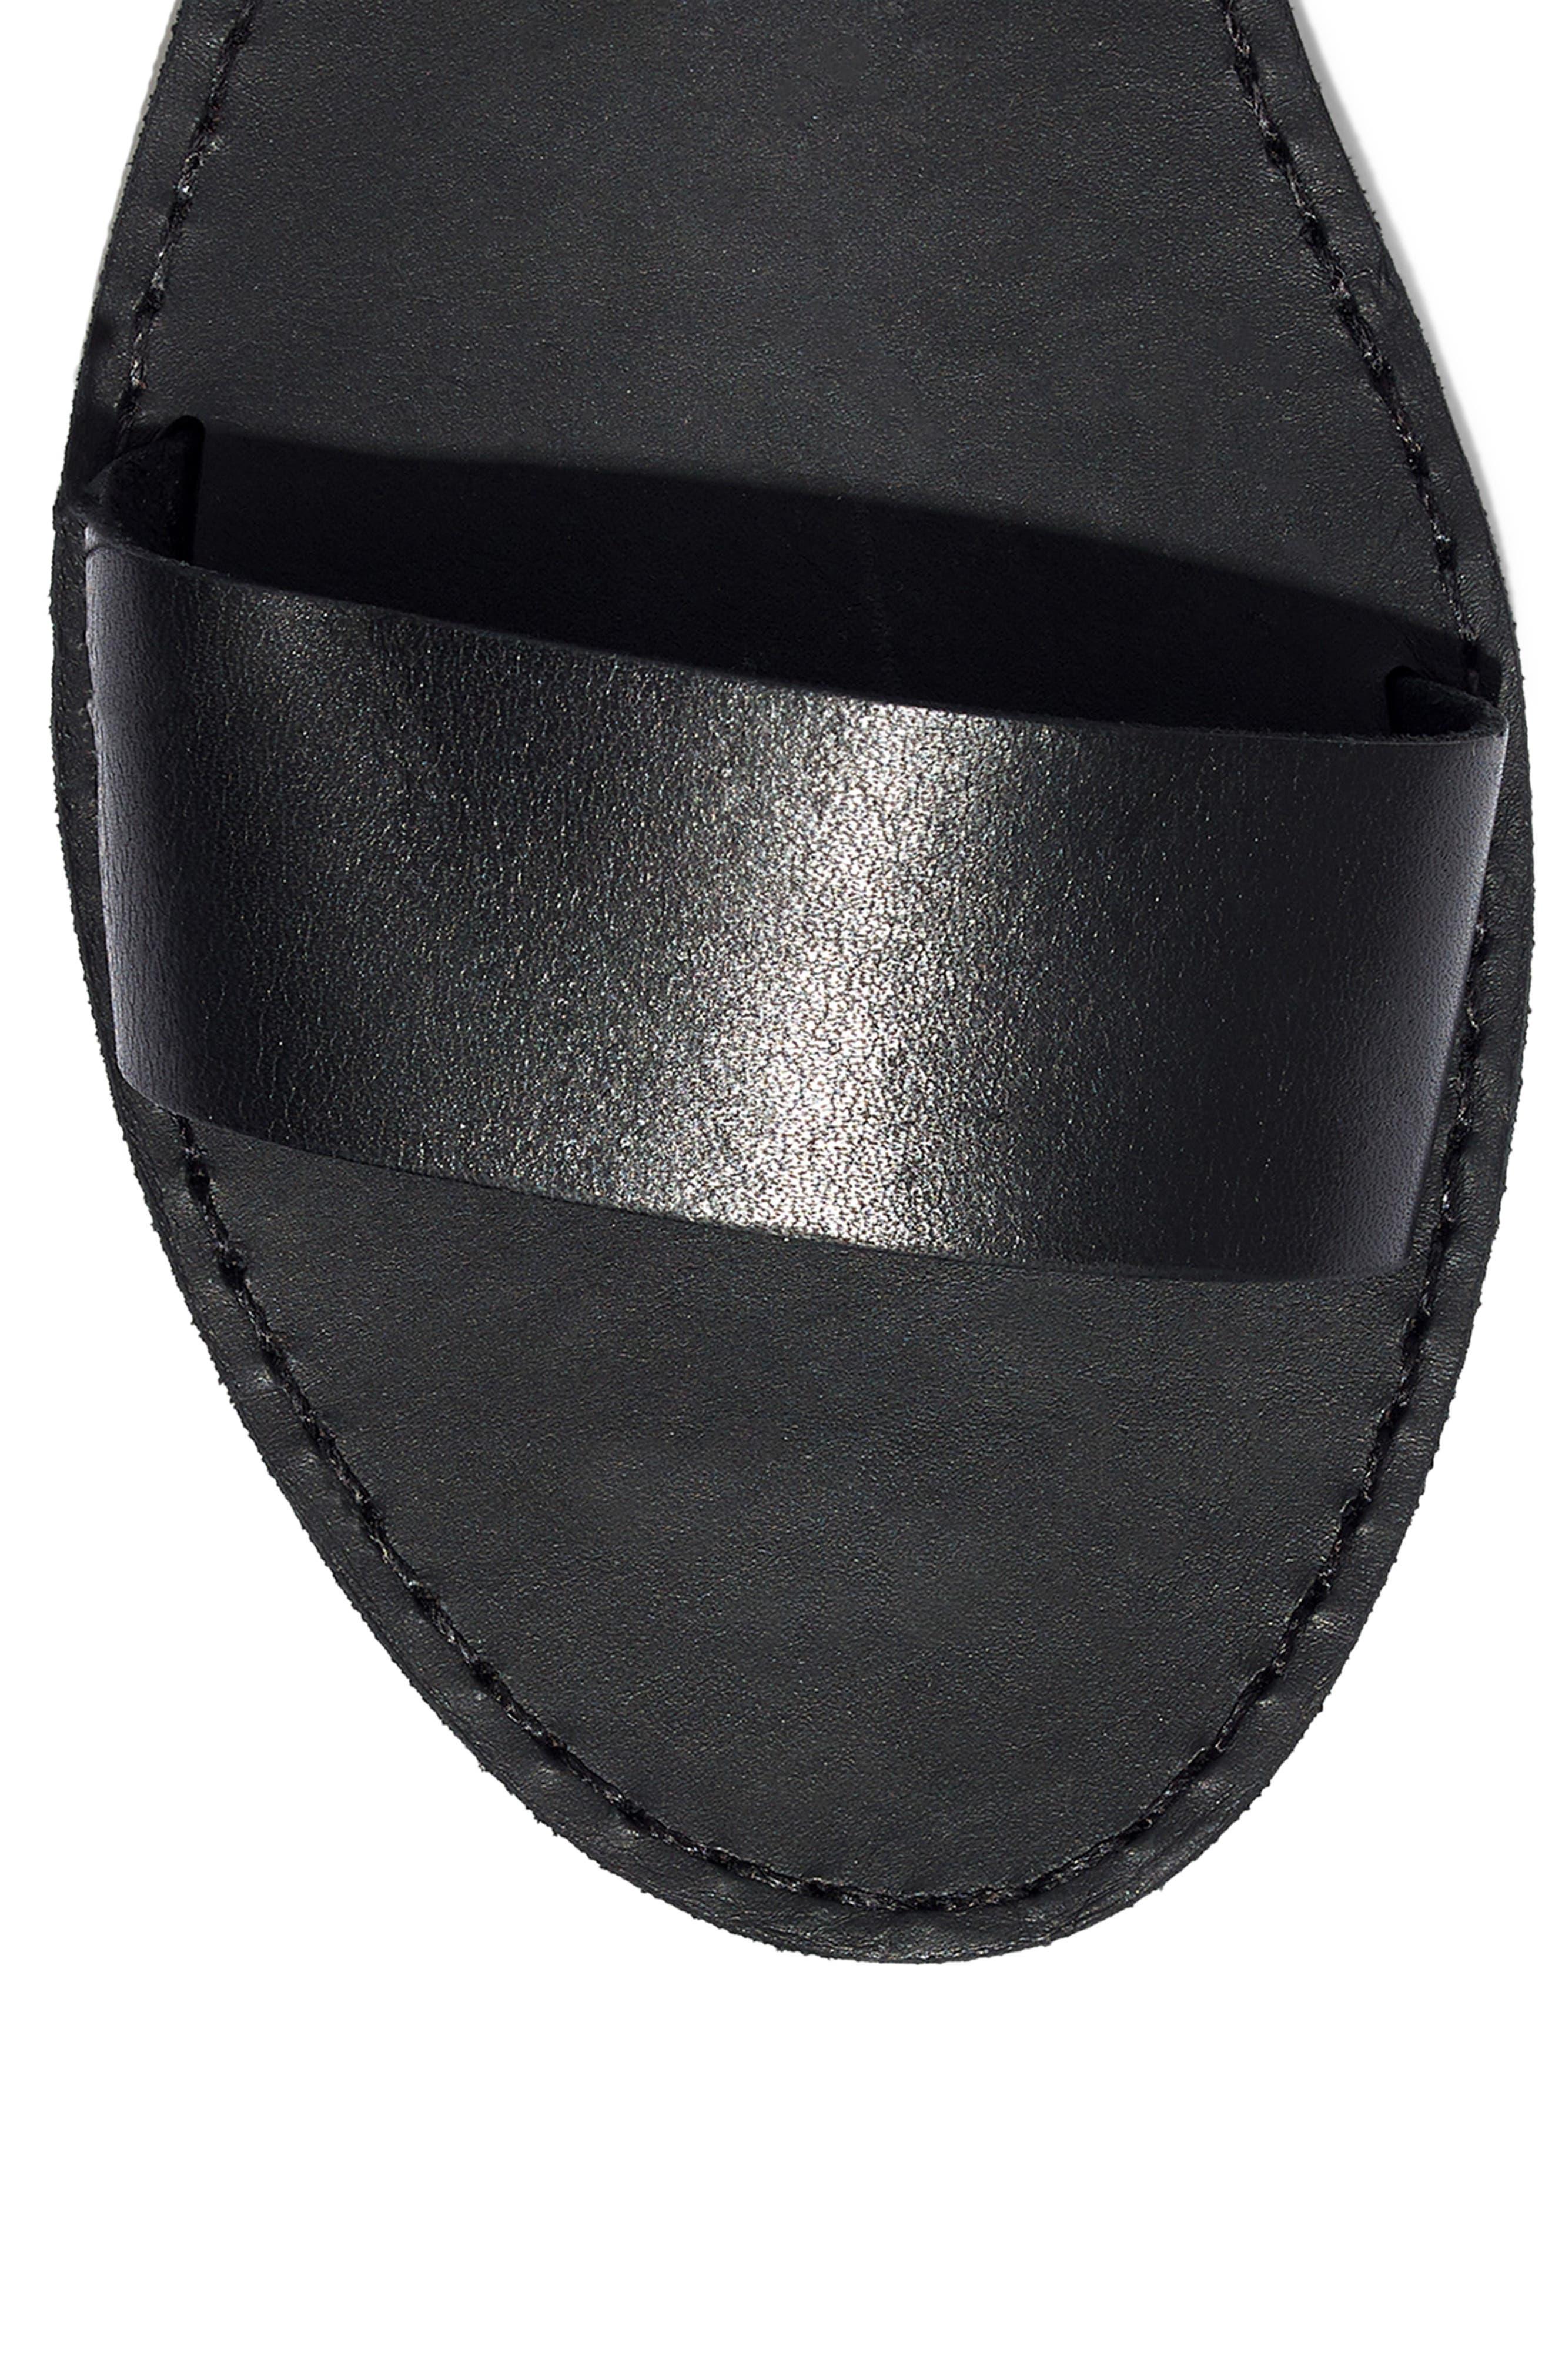 MADEWELL,                             The Boardwalk Ankle Strap Sandal,                             Alternate thumbnail 5, color,                             TRUE BLACK LEATHER